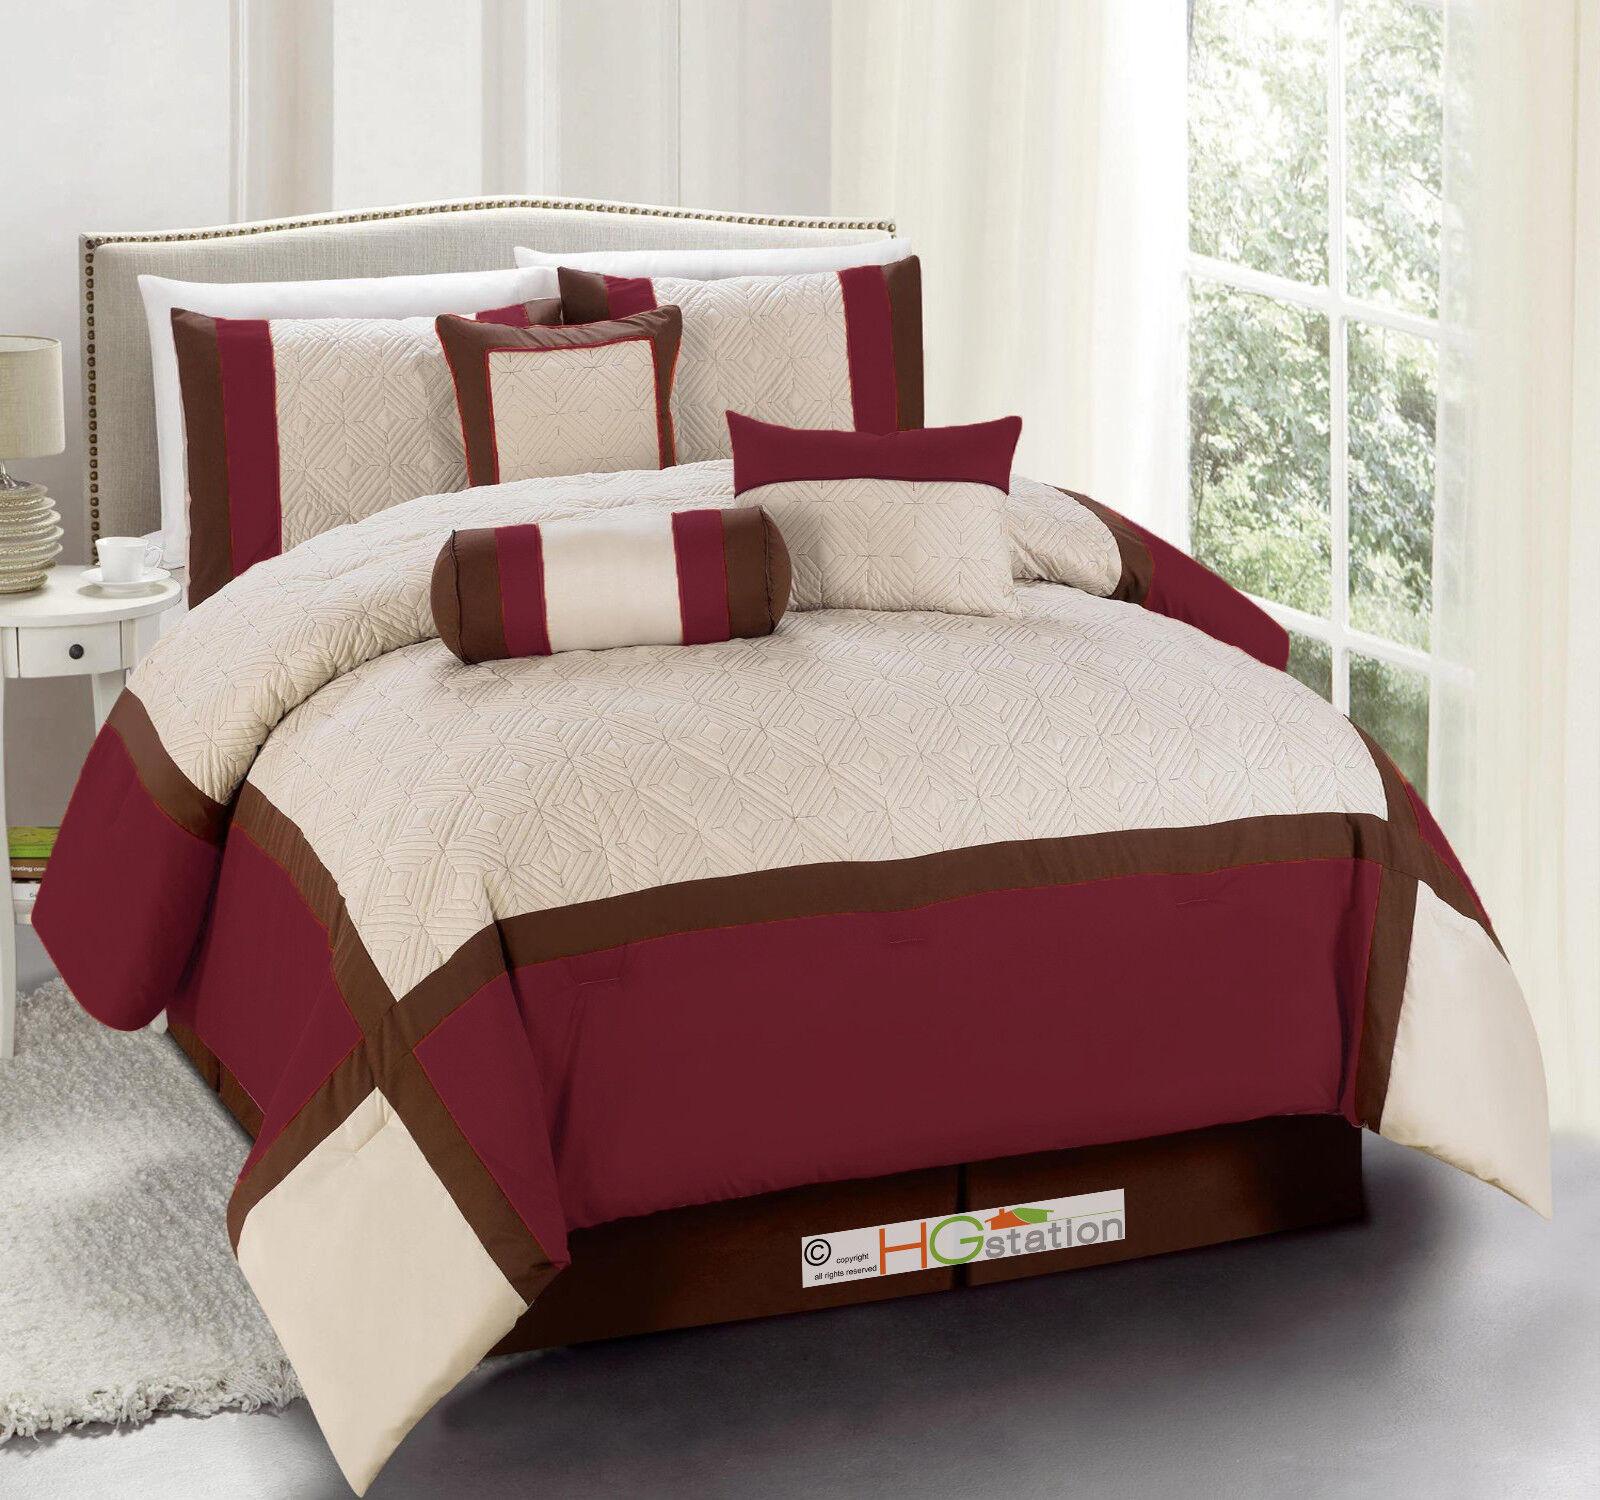 7-Pc Quilted Diamond Square Patchwork Modern Comforter Set Burgundy braun King